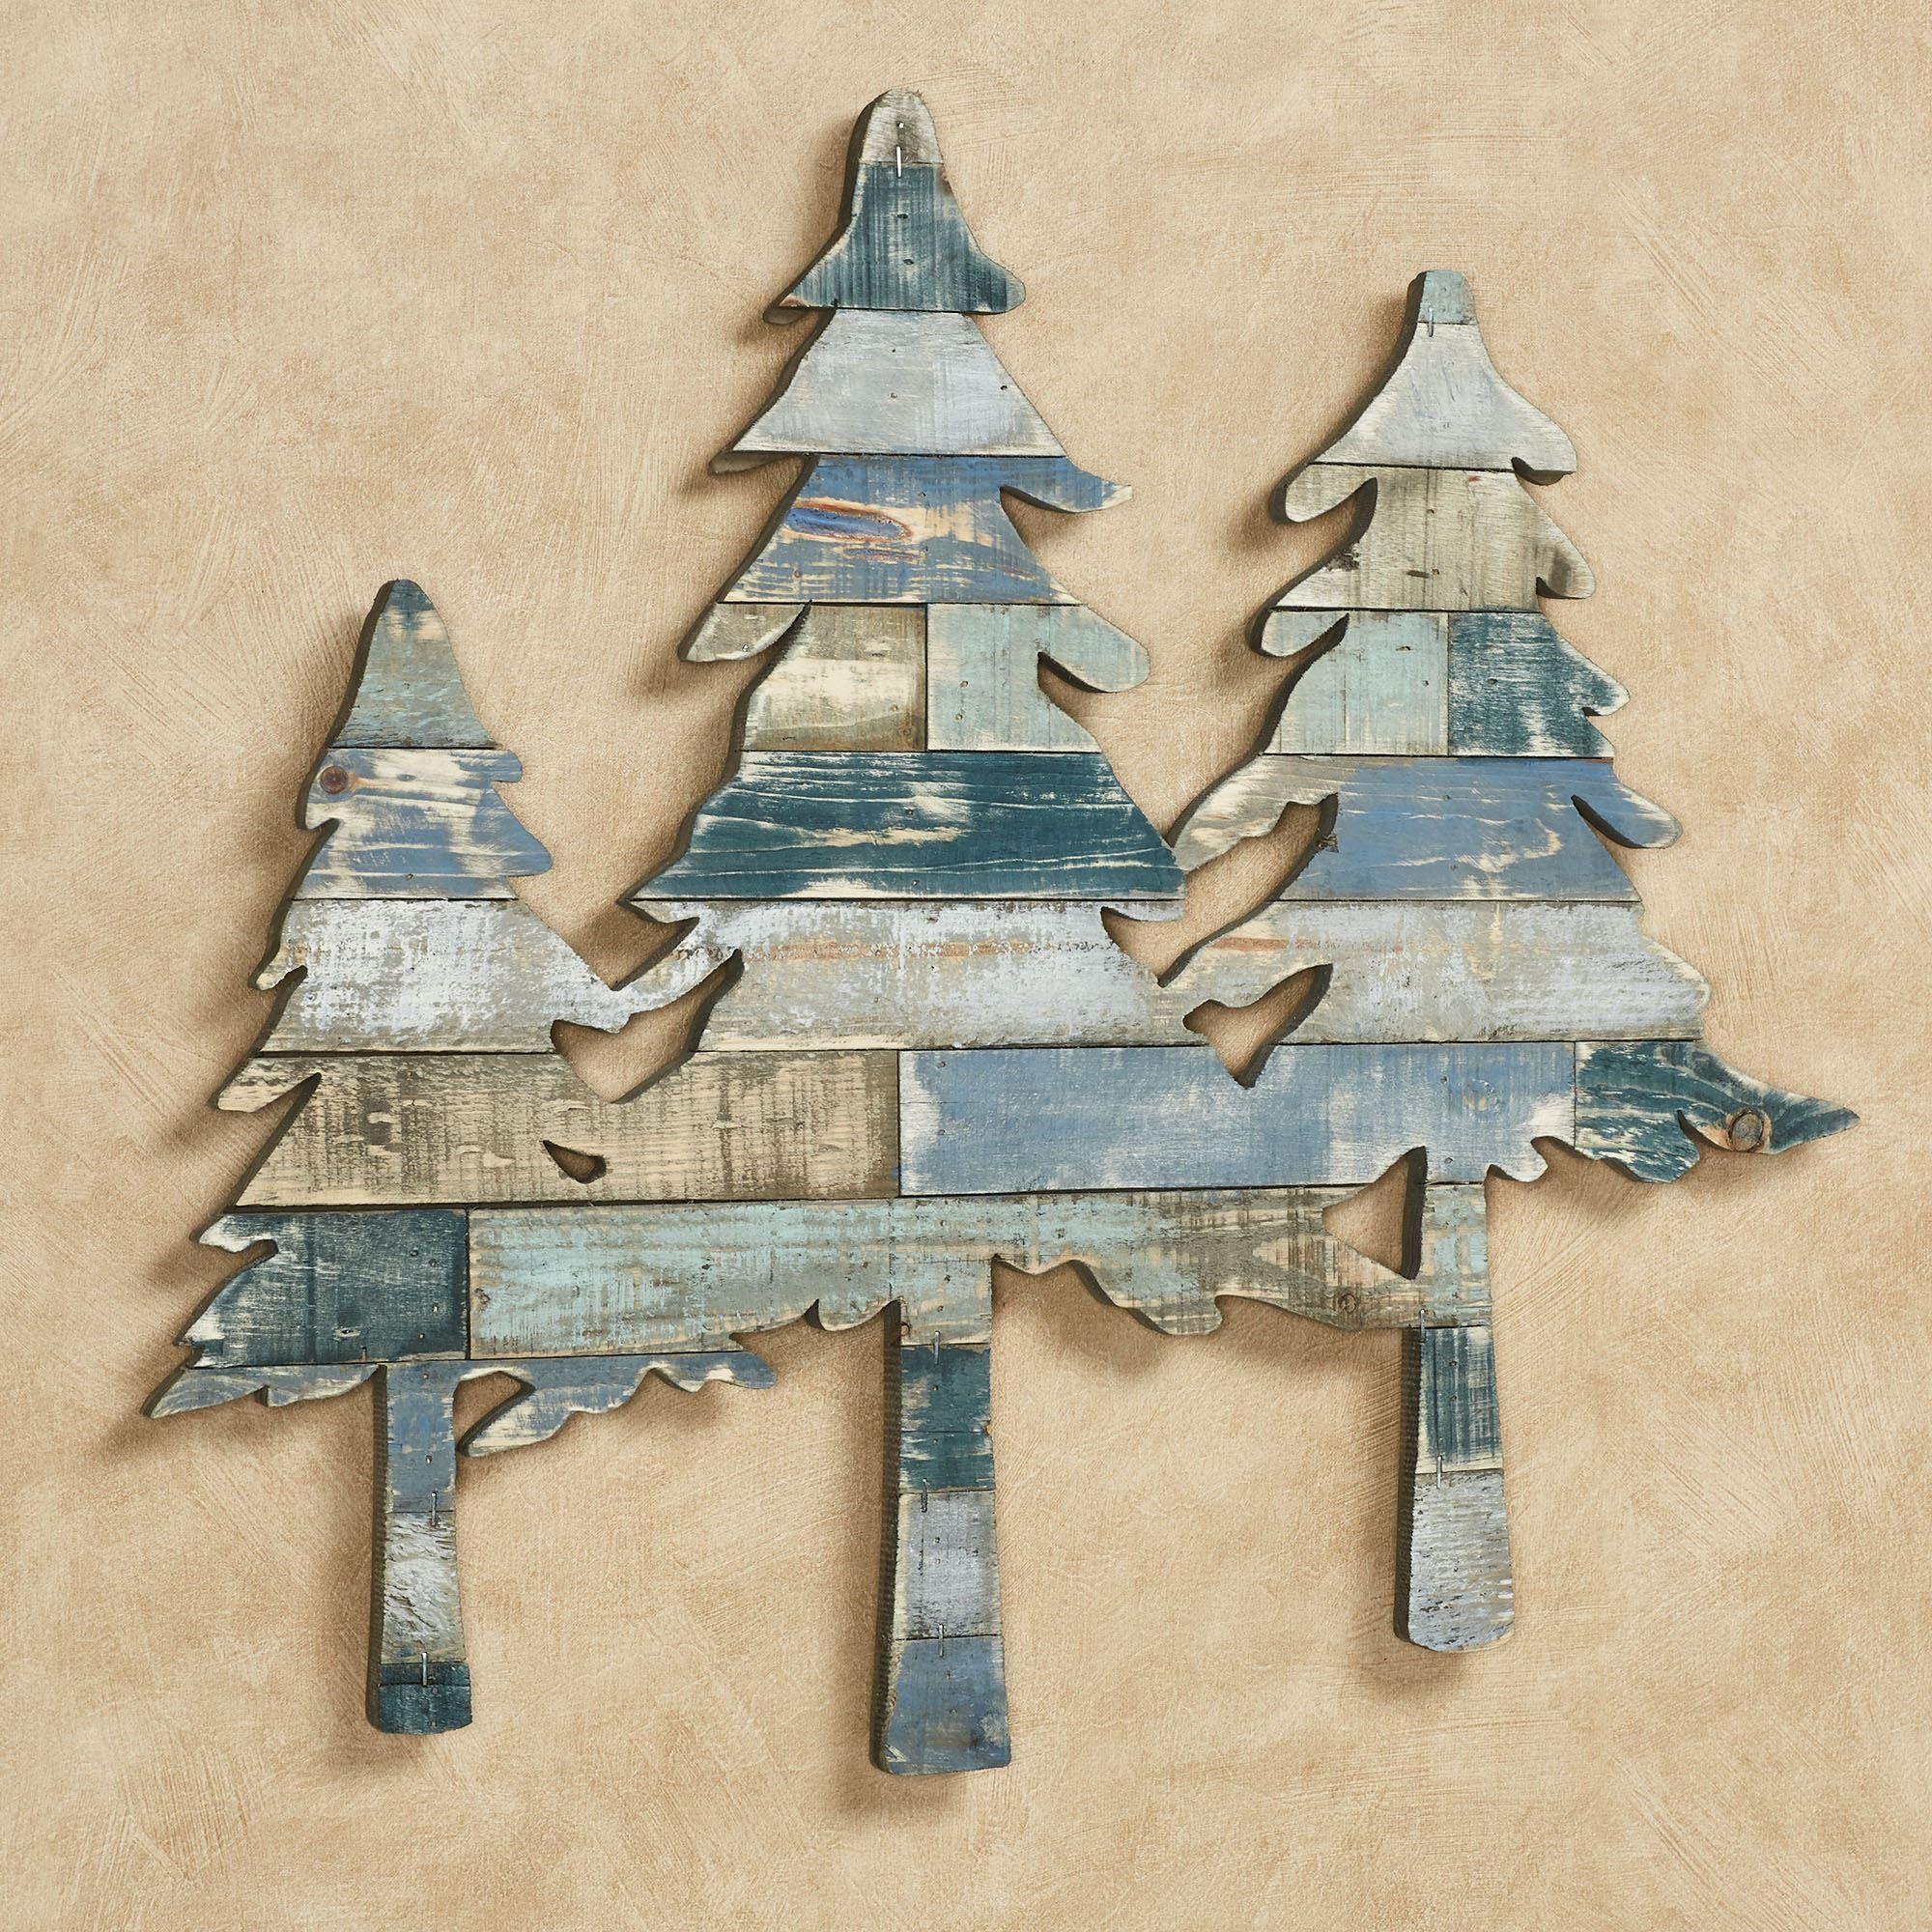 Pine Tree Shaped Slatted Wooden Wall Art